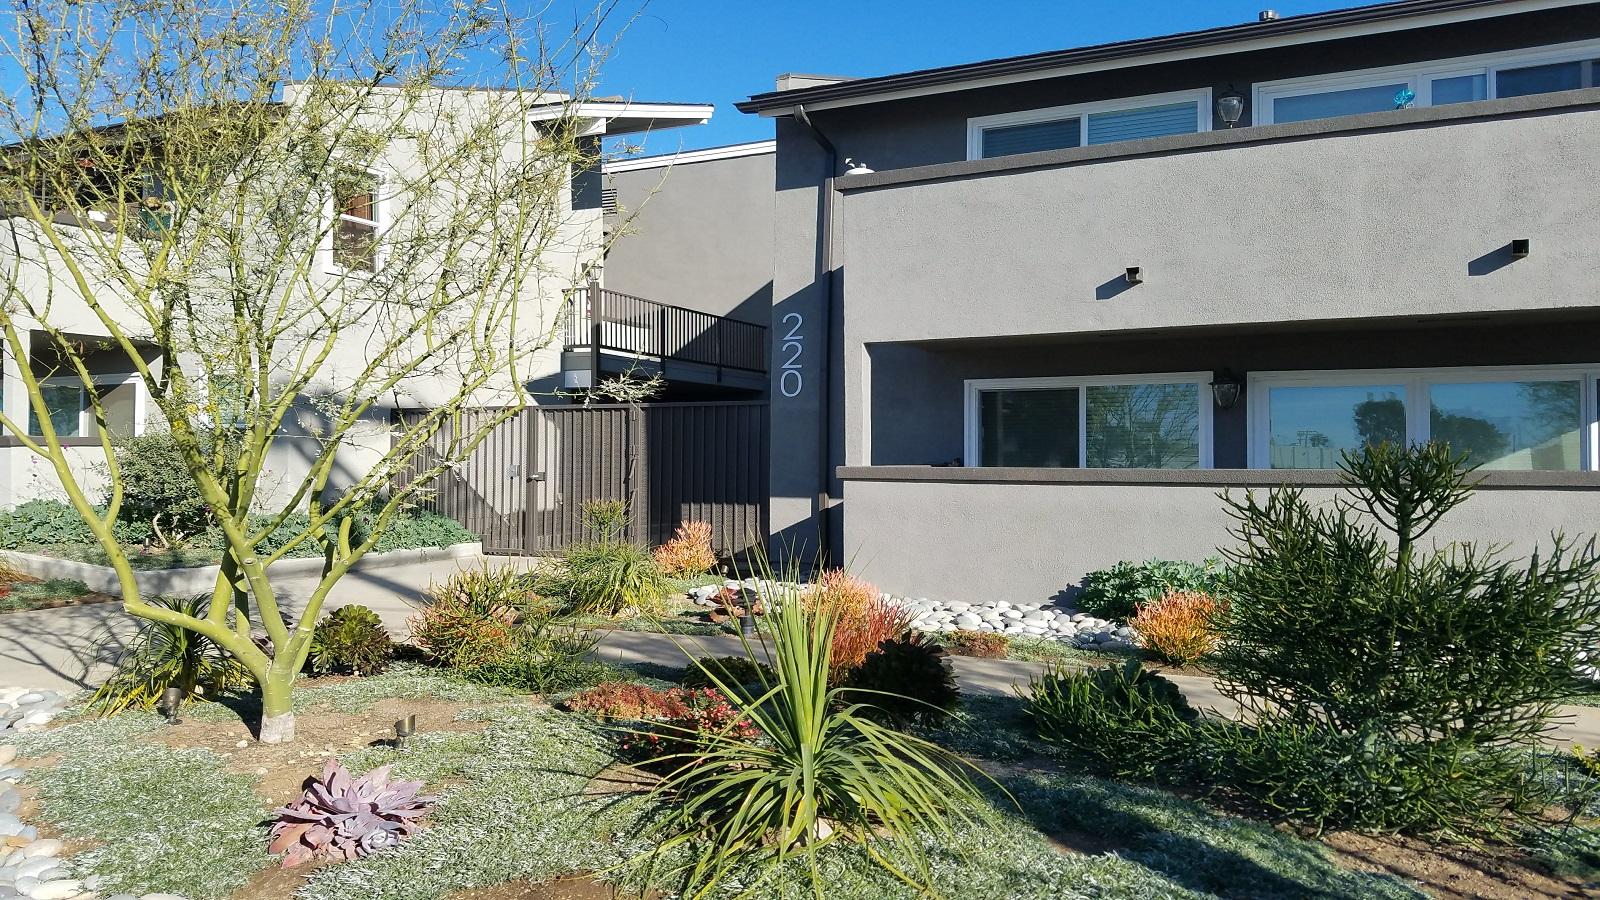 Barnes Manor Apartments   220 Barnes Street, Oceanside, CA 92054   6 Units   Built in 1979 / Renovated in 2017   $1,450,000   $241,667 Per Unit   $386.67 Per SF   3.95% CAP